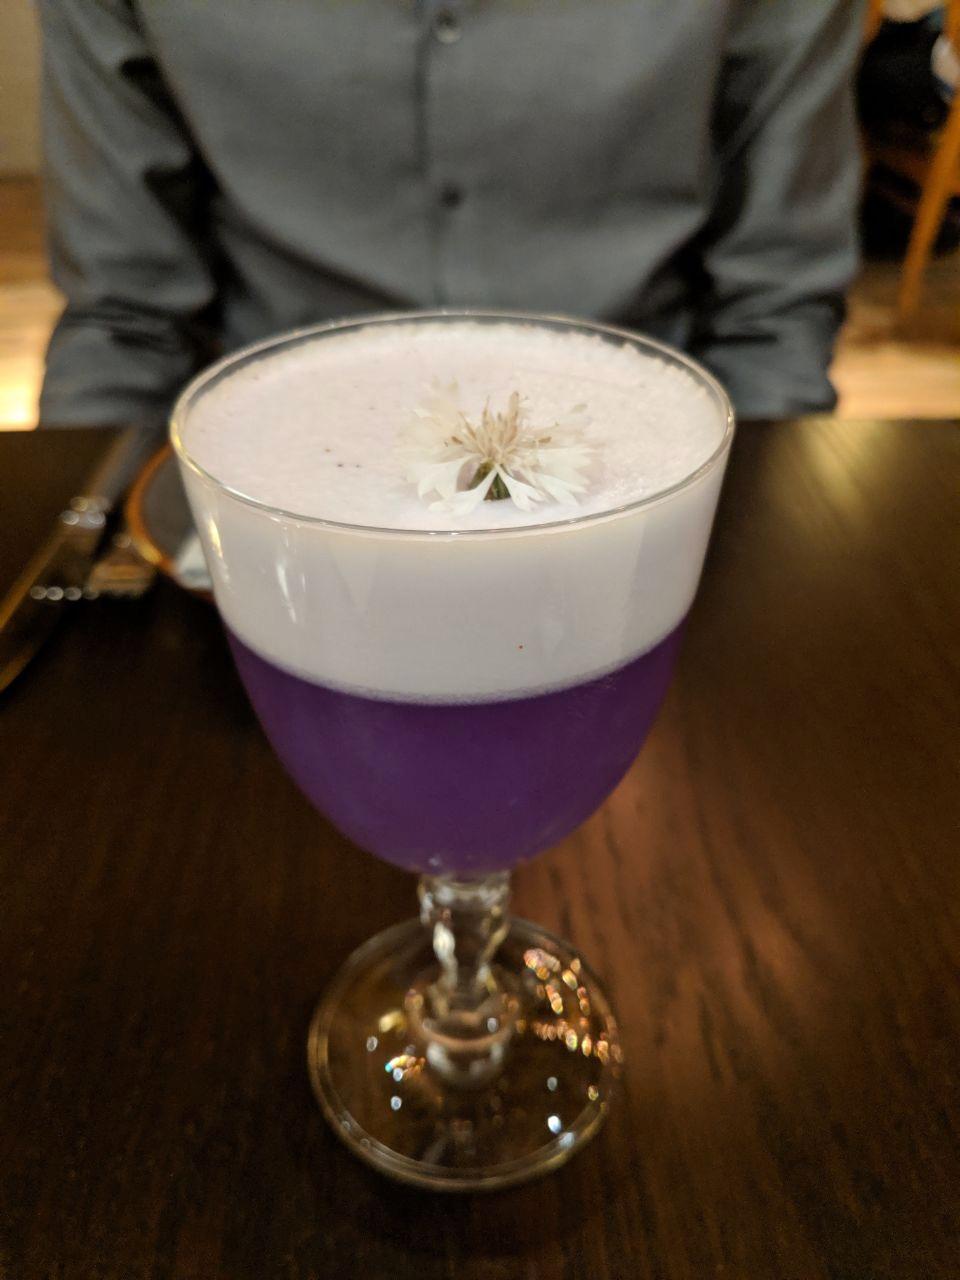 ROOH's Patna Fizz Cocktail